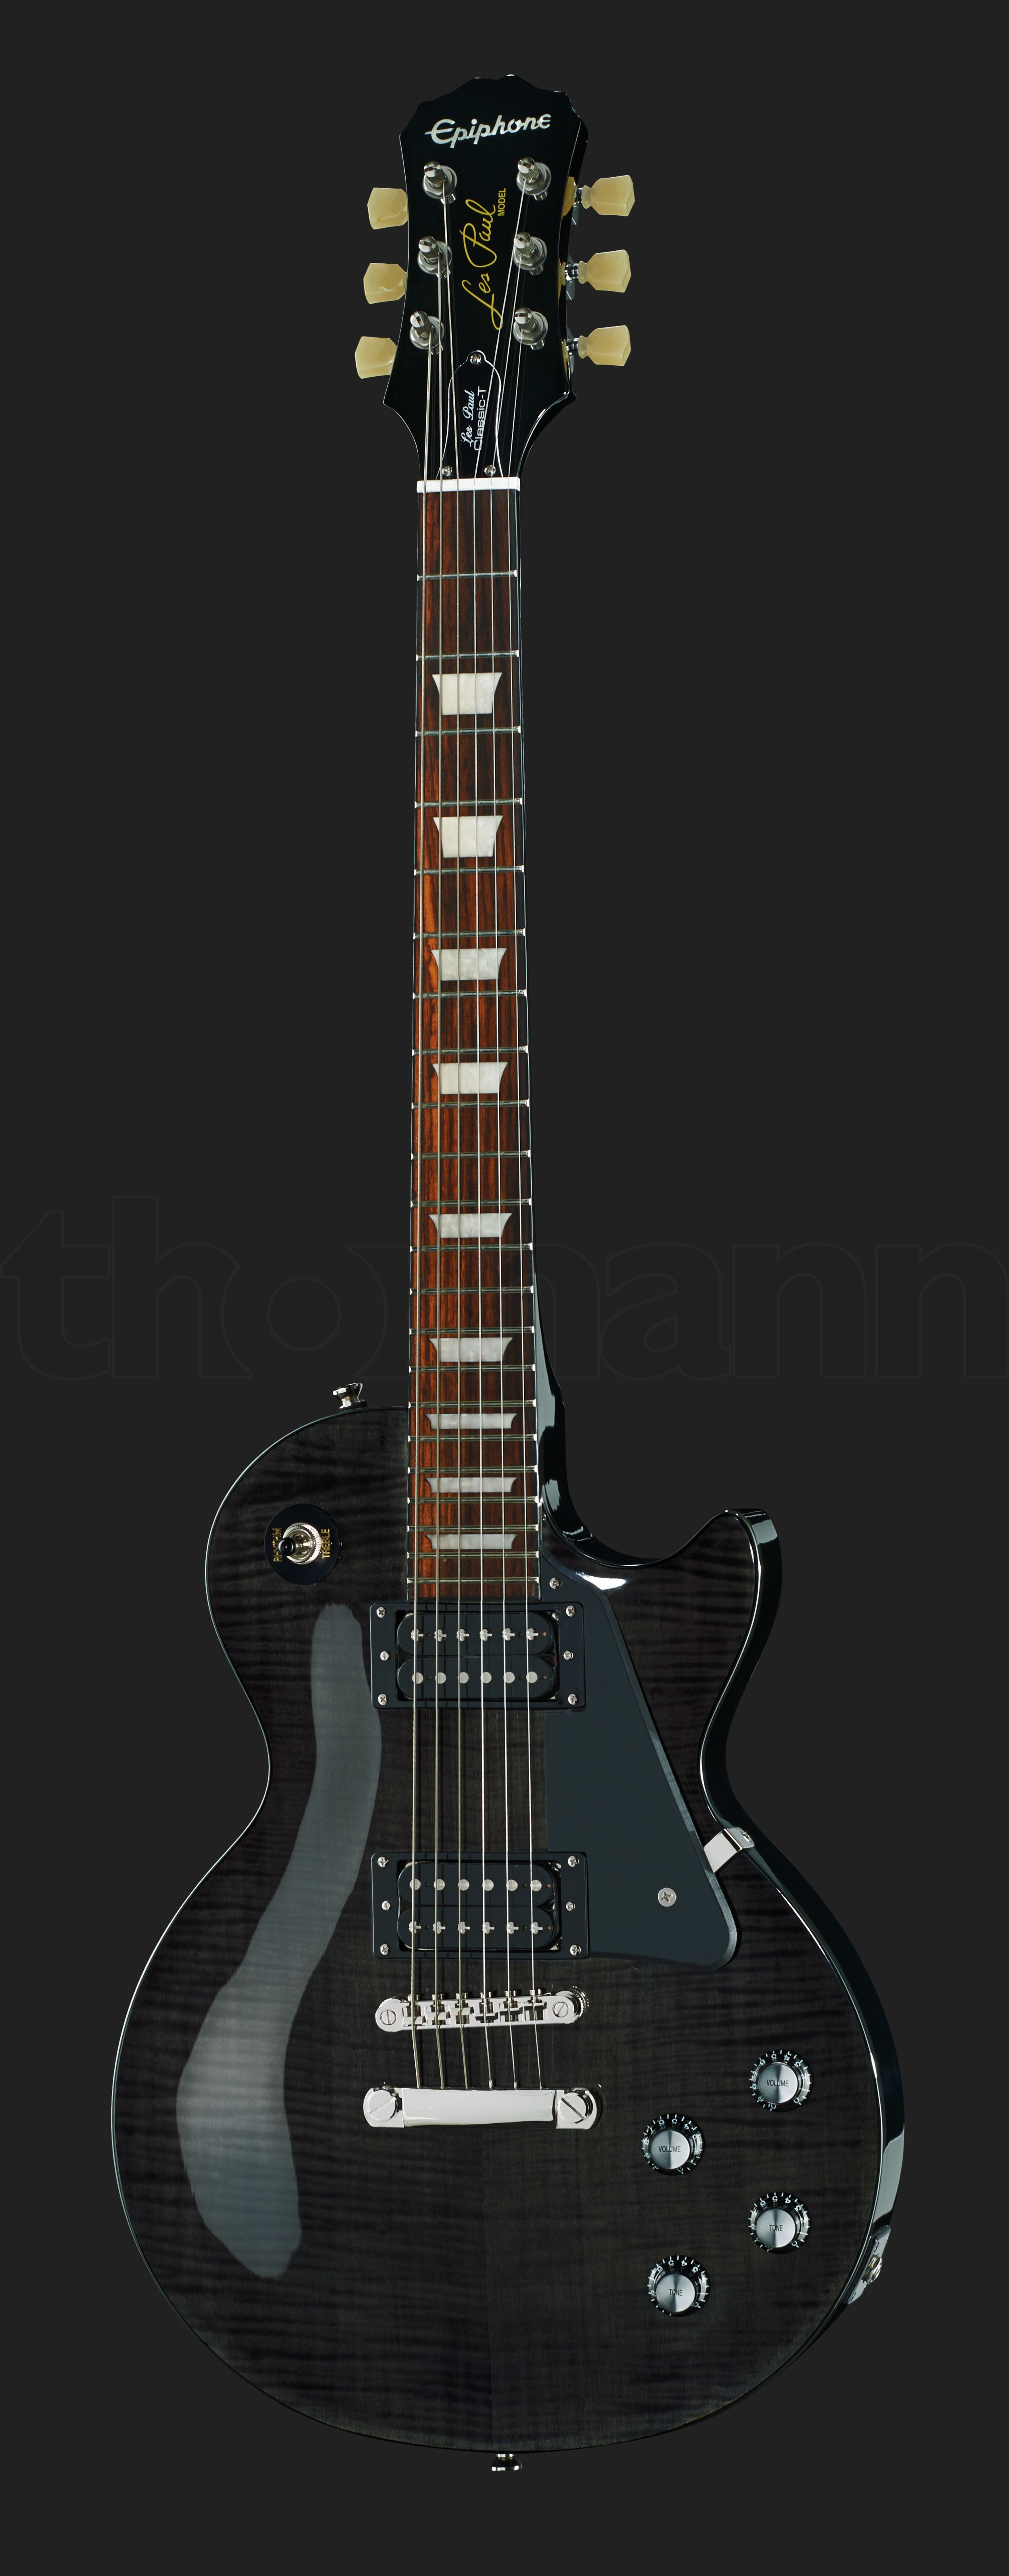 epiphone les paul classic t me thomann greece electric guitars epiphone les paul epiphone. Black Bedroom Furniture Sets. Home Design Ideas